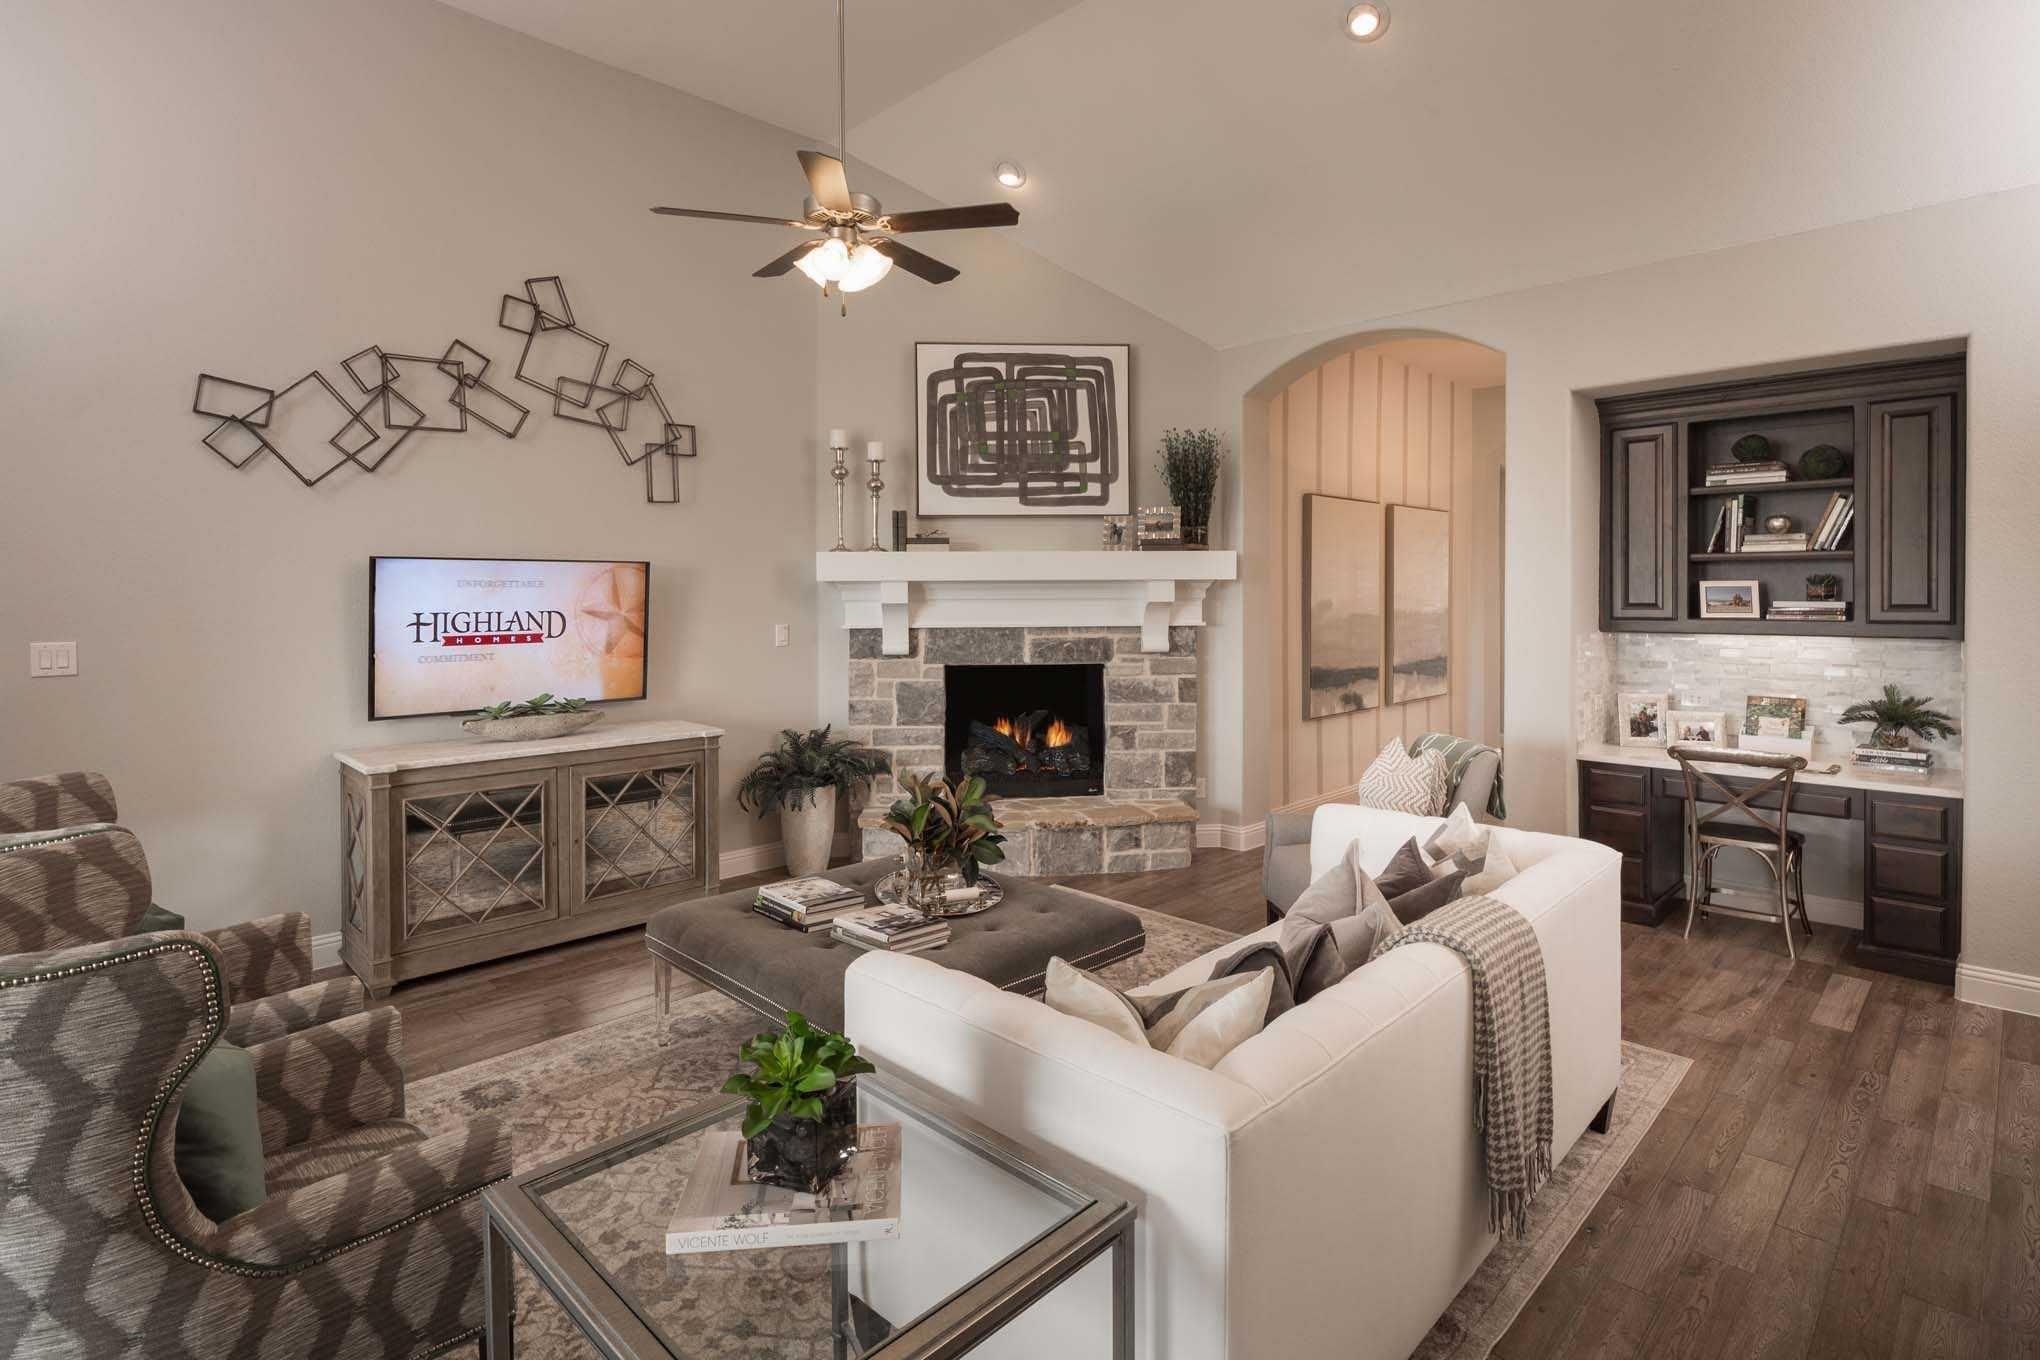 Highland Homes Plan 262 Model Home In Dallas Fort Worth Texas Trinity Falls 80s Community Livingroom New Home Communities Home New Home Builders